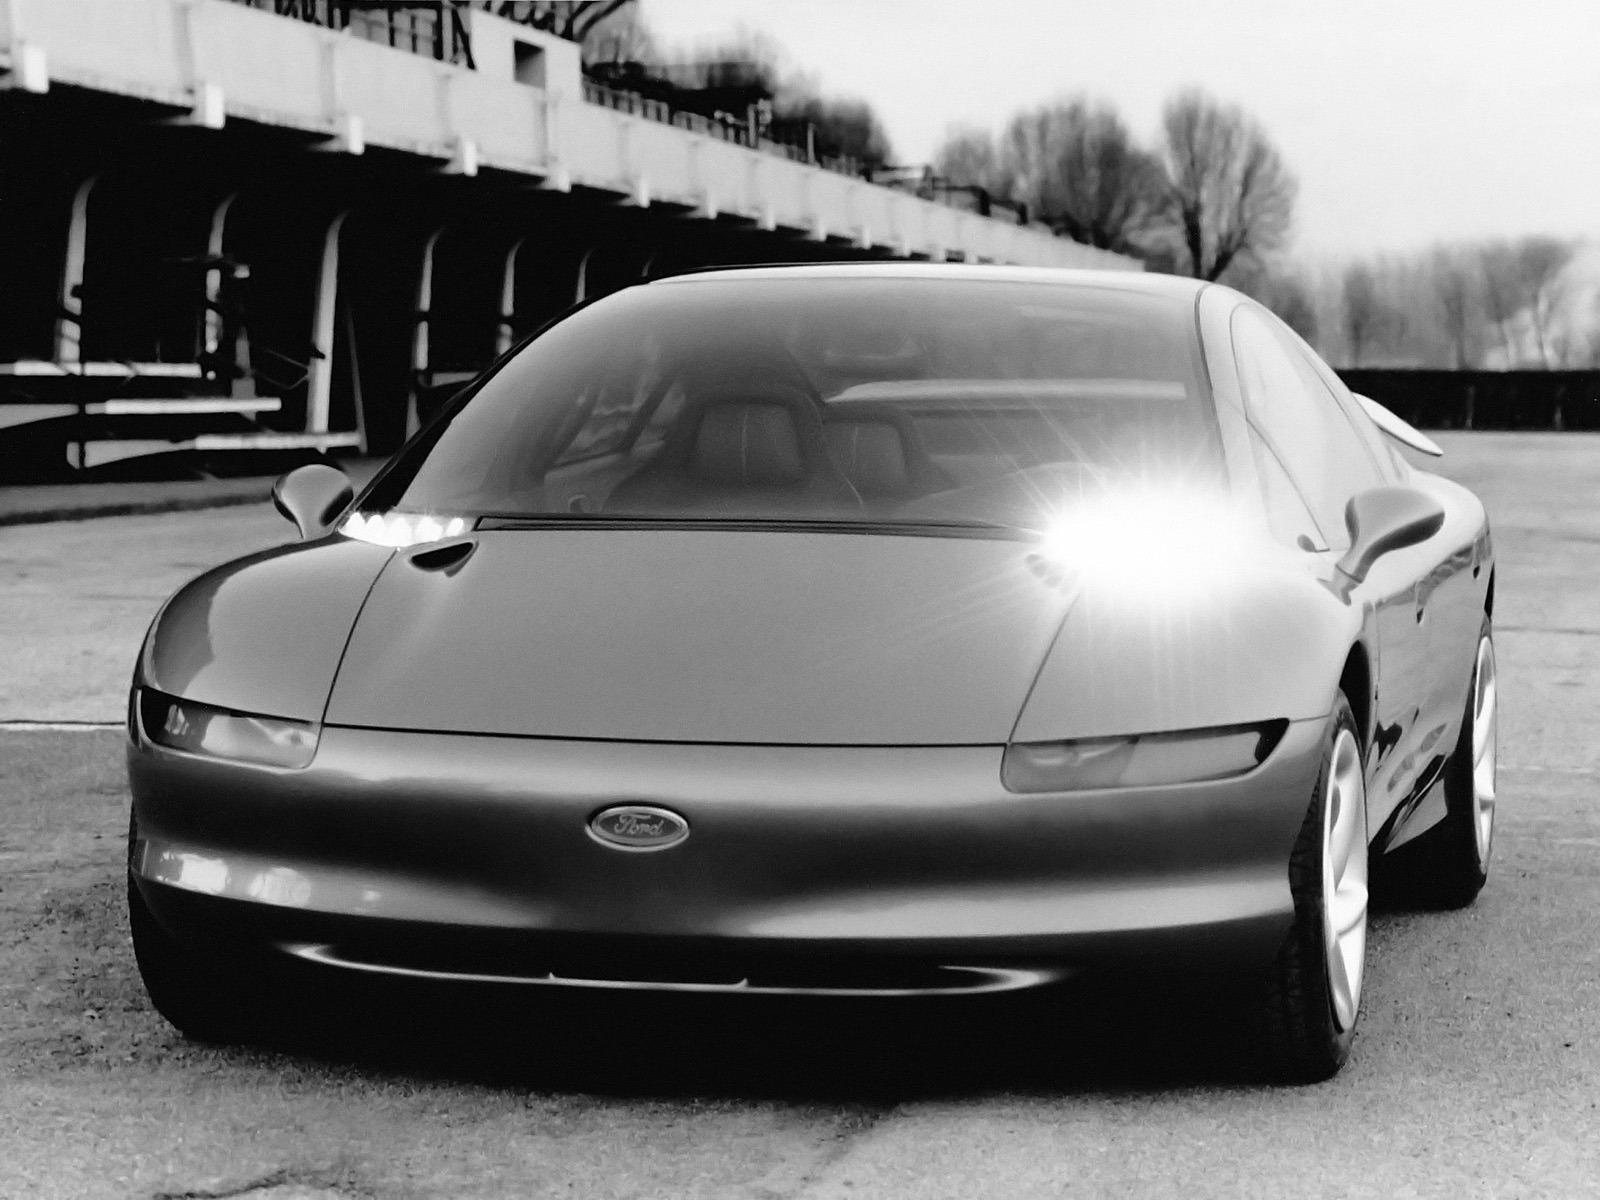 1989-Ghia-Ford-Via-Concept-01